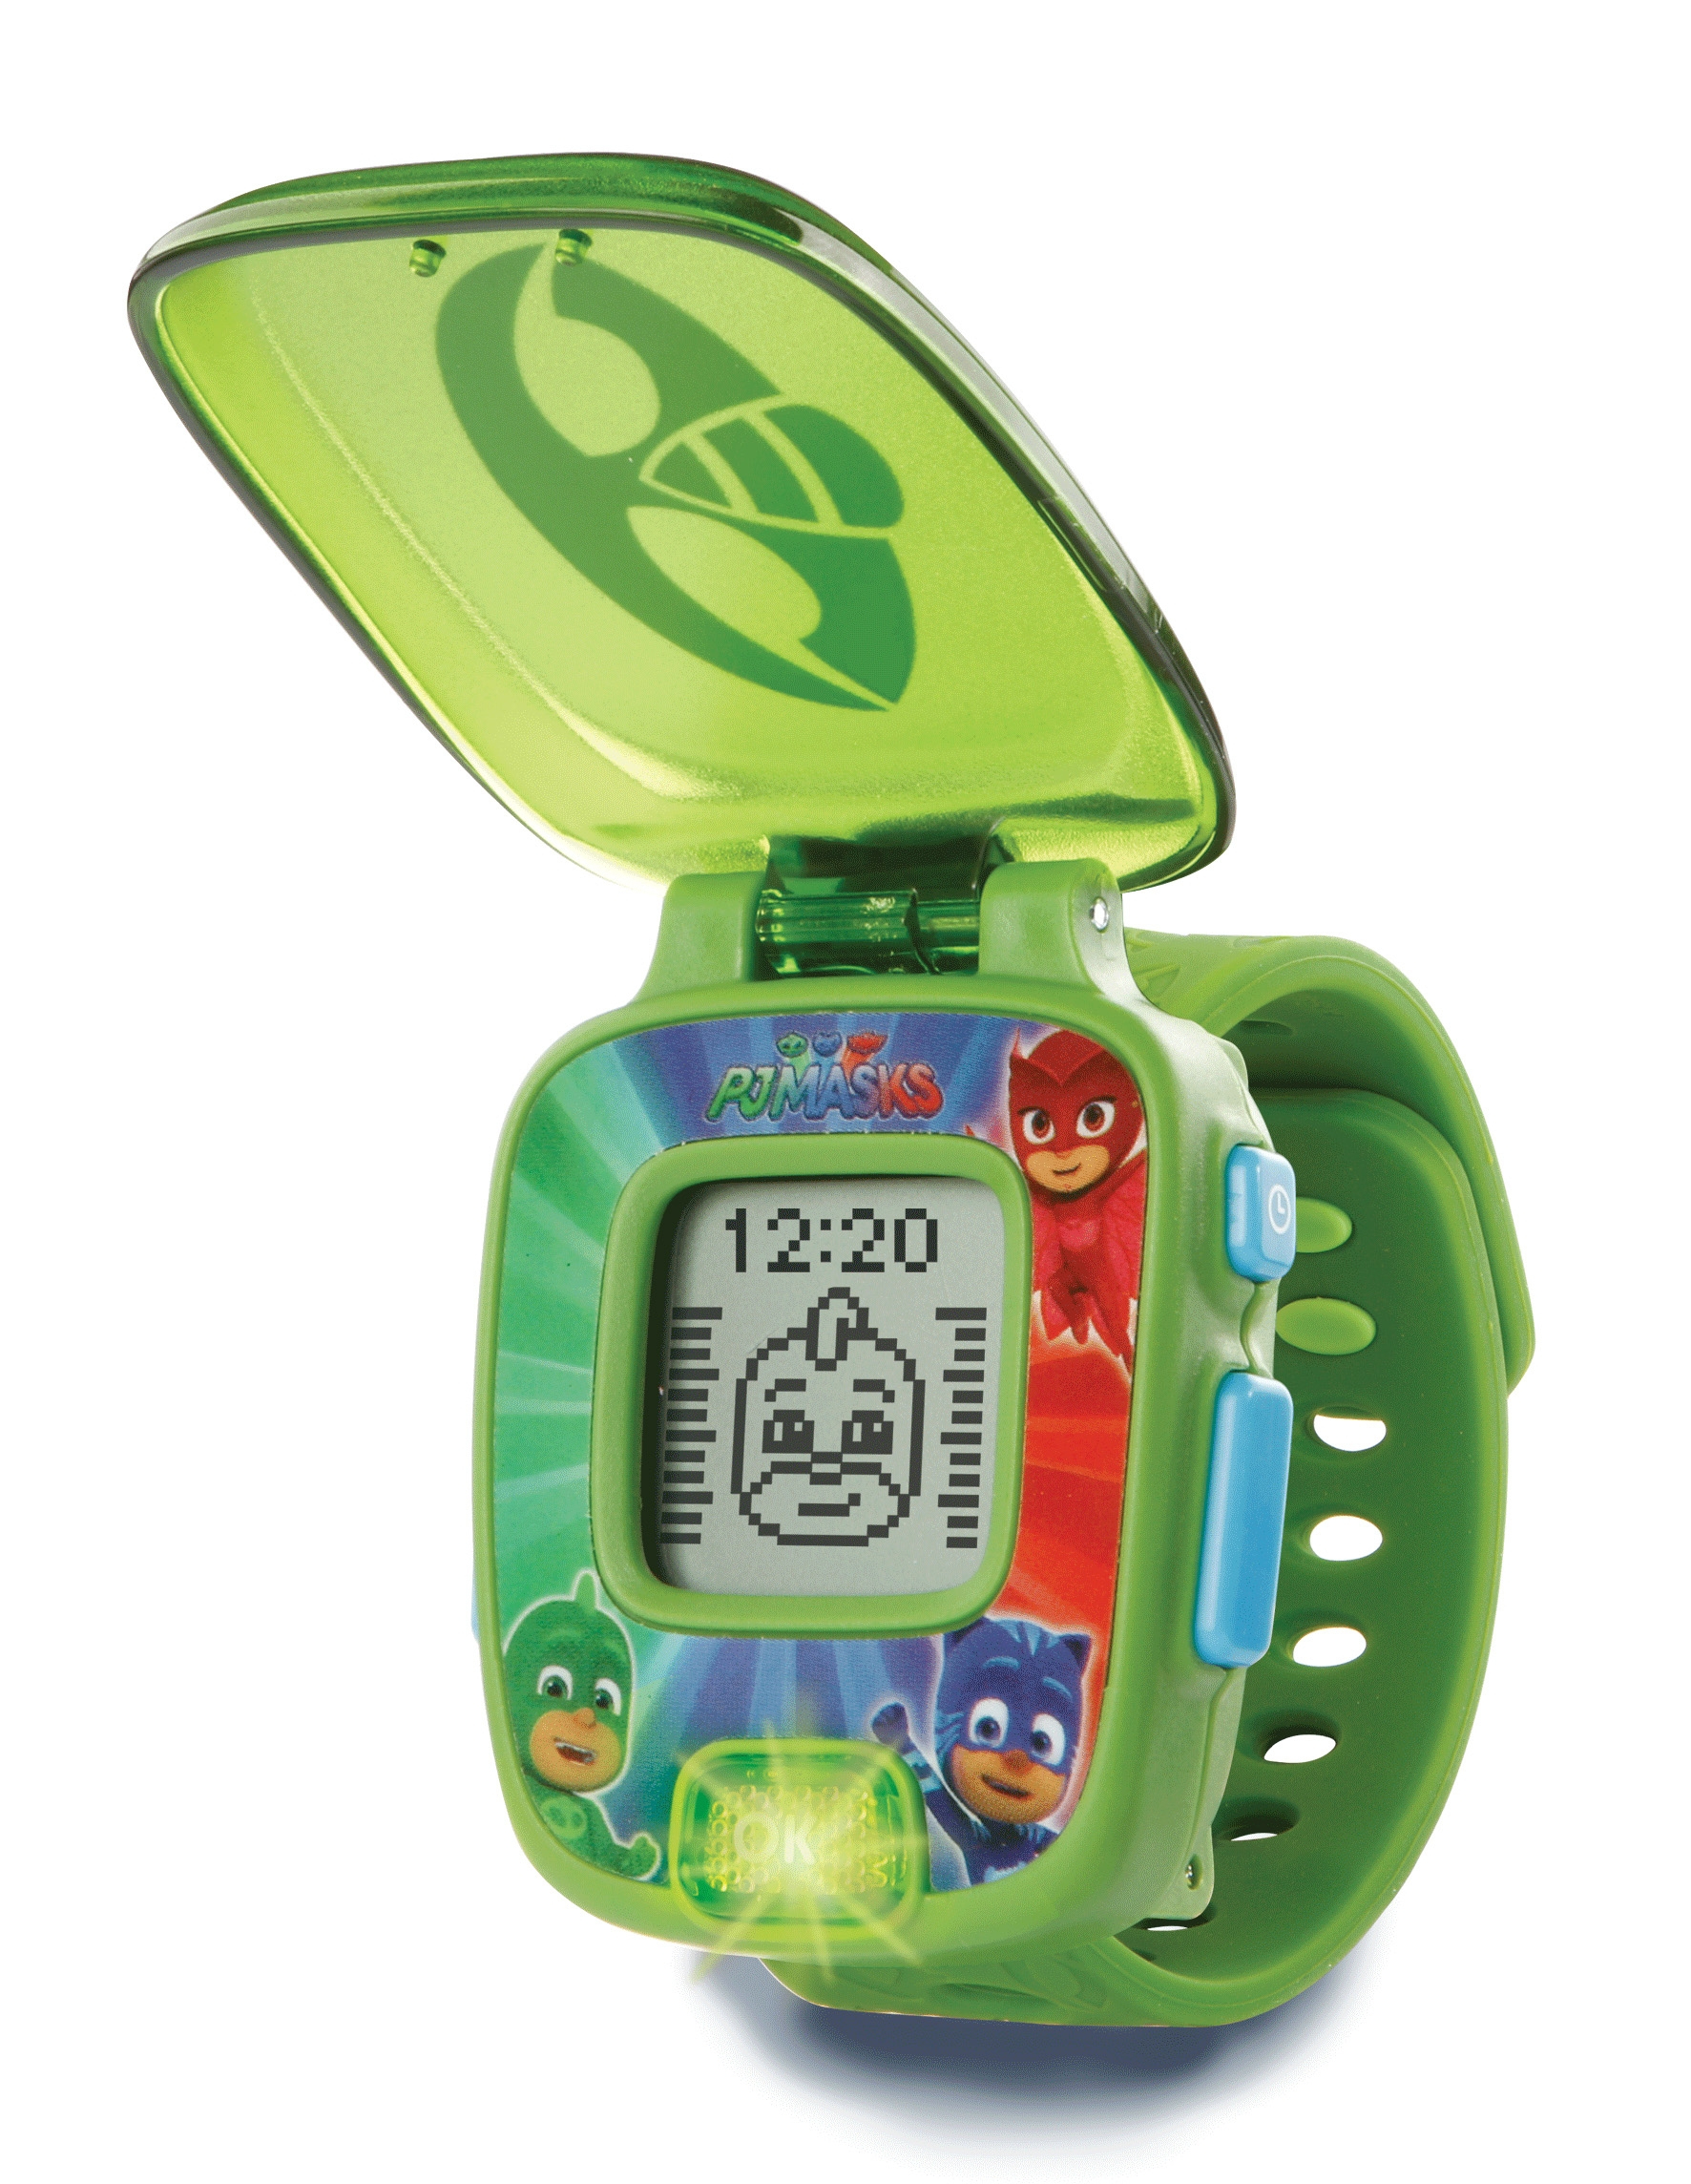 VTech PJ Masks - Gekko Learning Watch Ragazzo/Ragazza giocattolo educativo